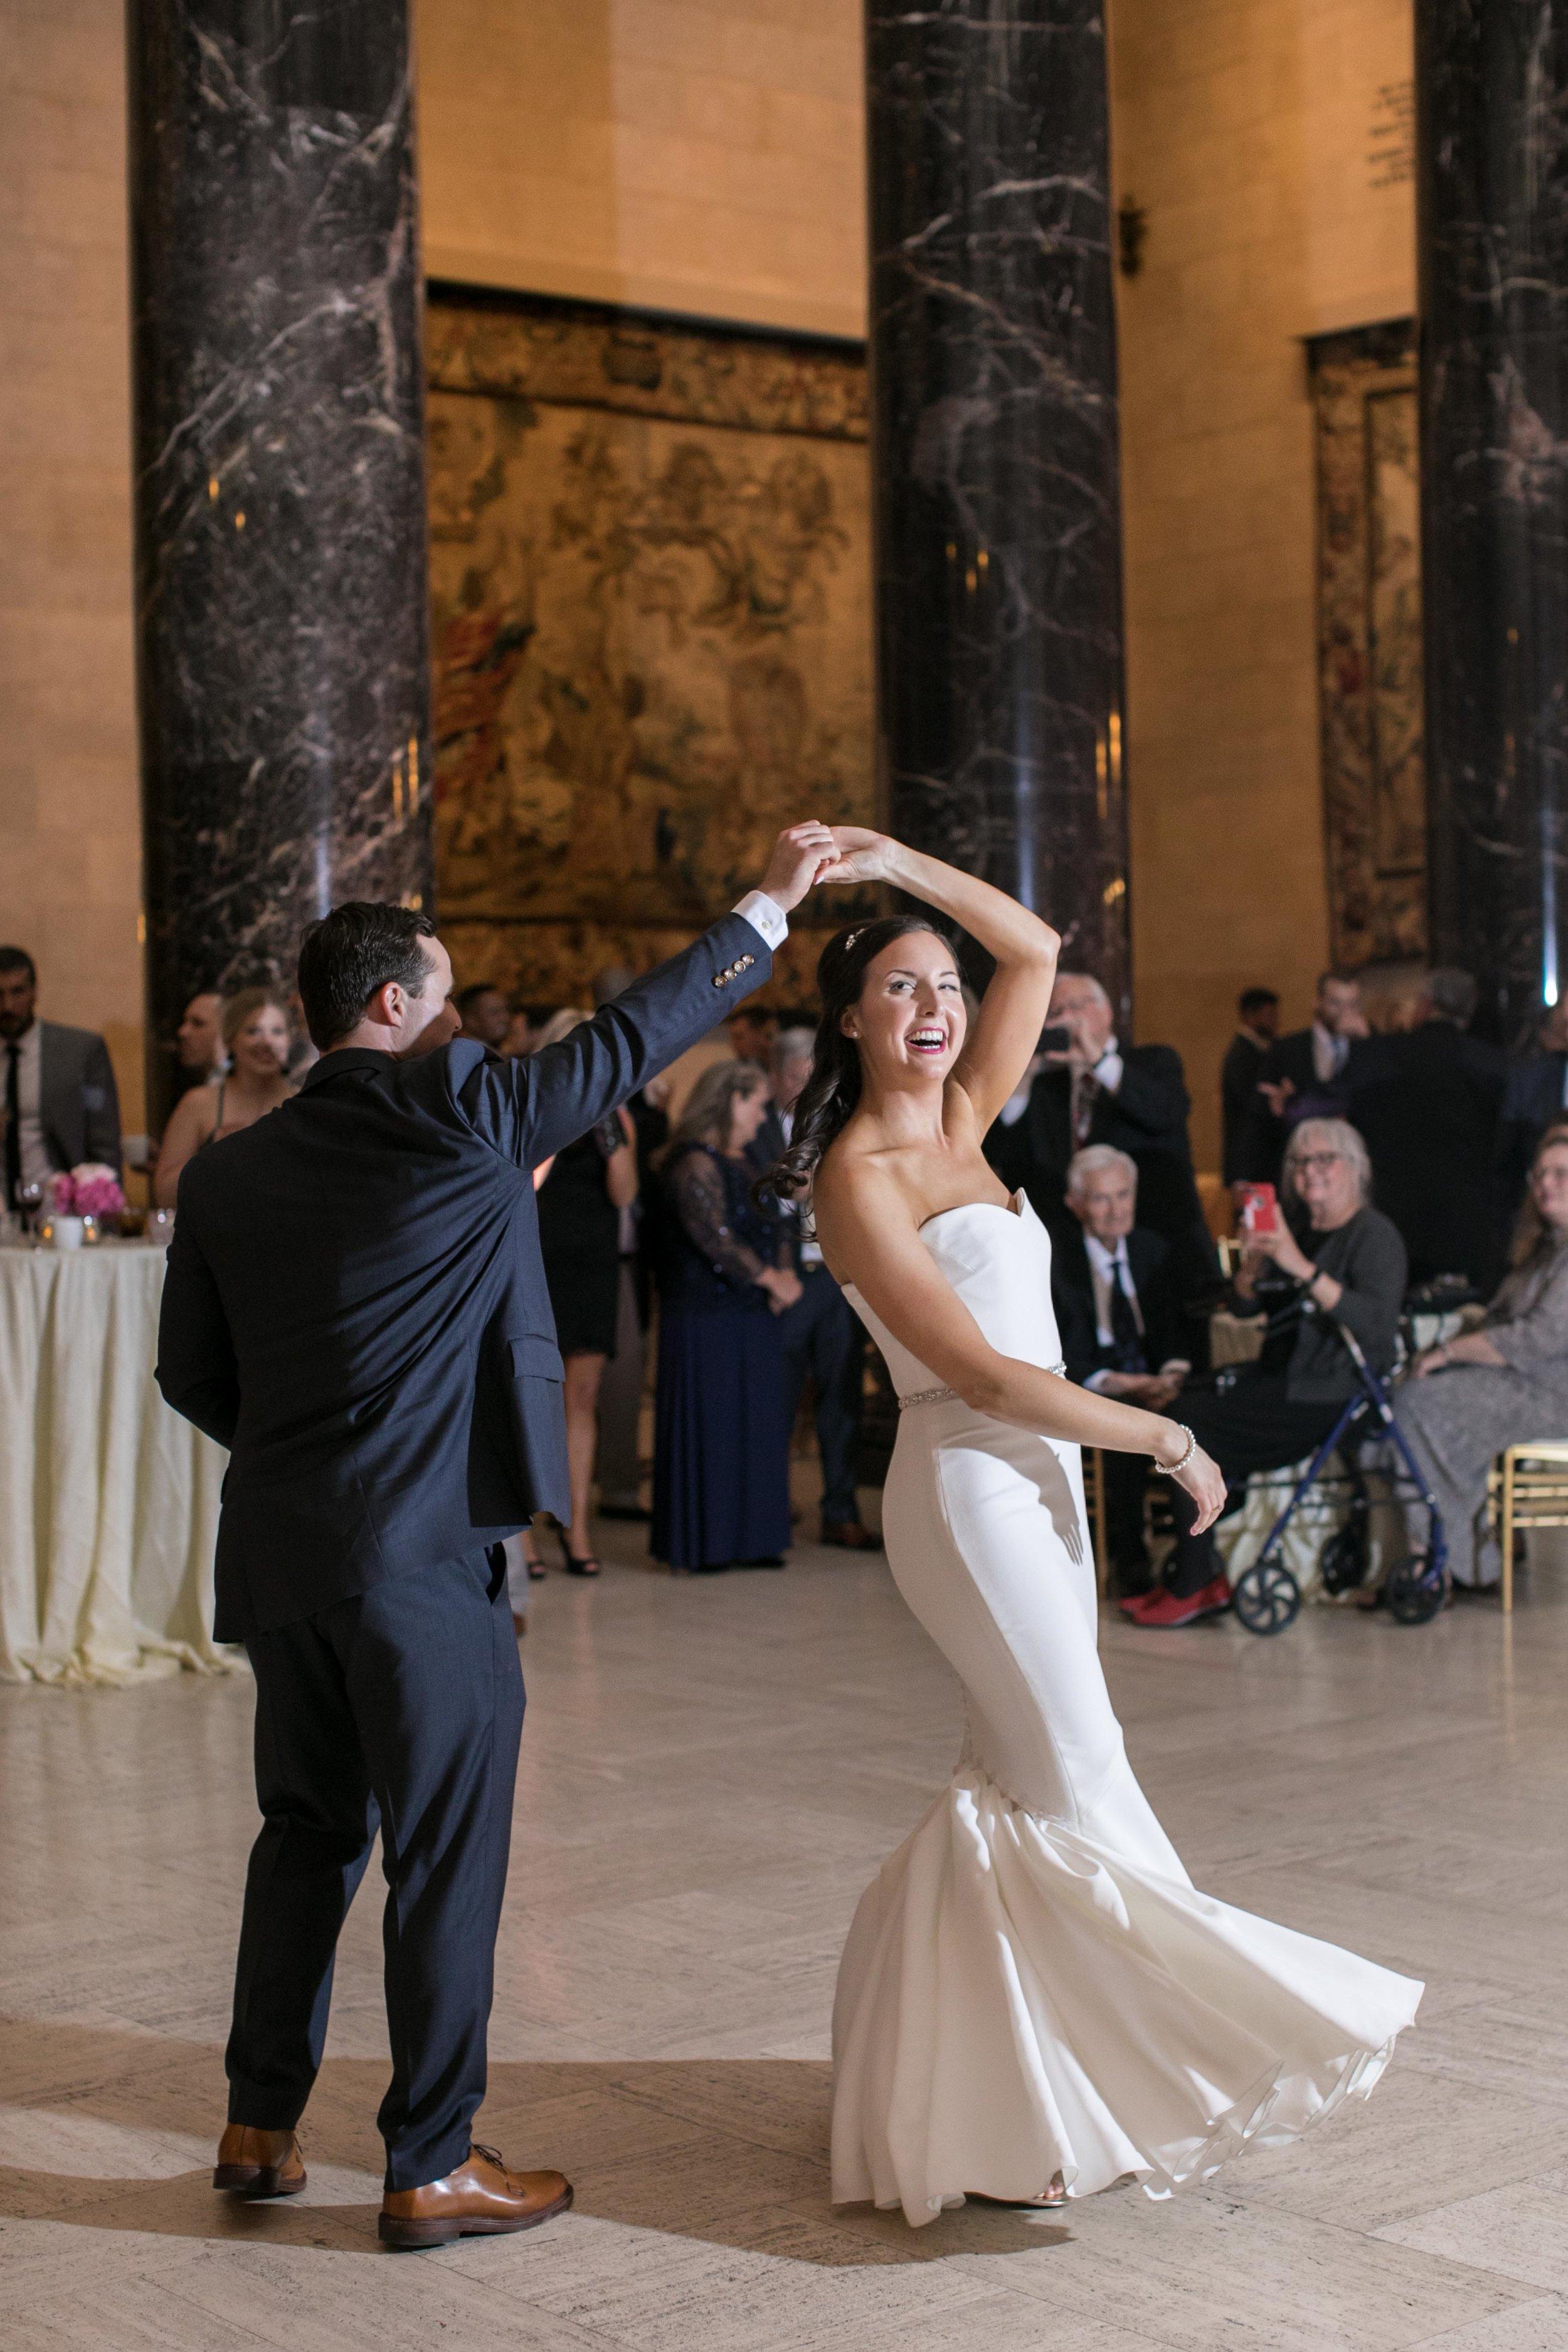 nelson-atkins-wedding-78.jpg